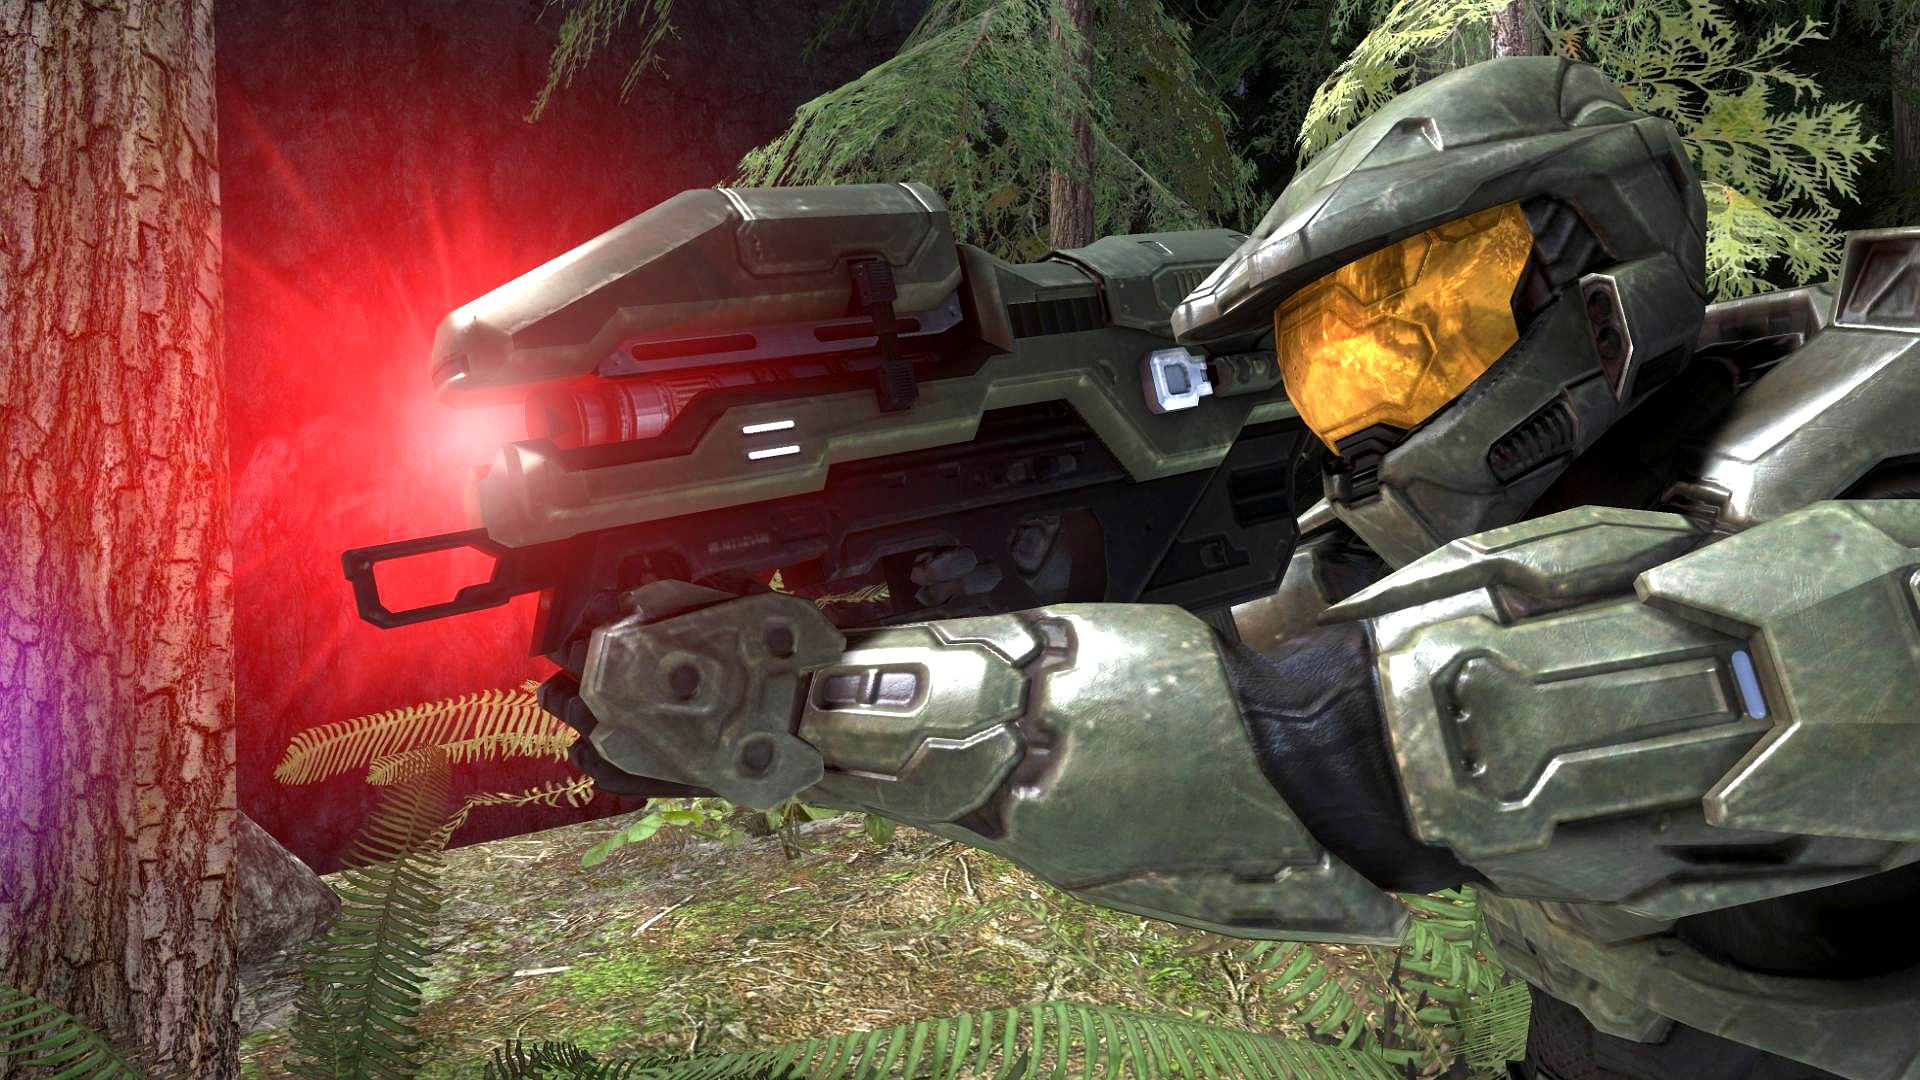 1523551496 ece05f6a4a o Halo 3: Master Chief Laser Sight